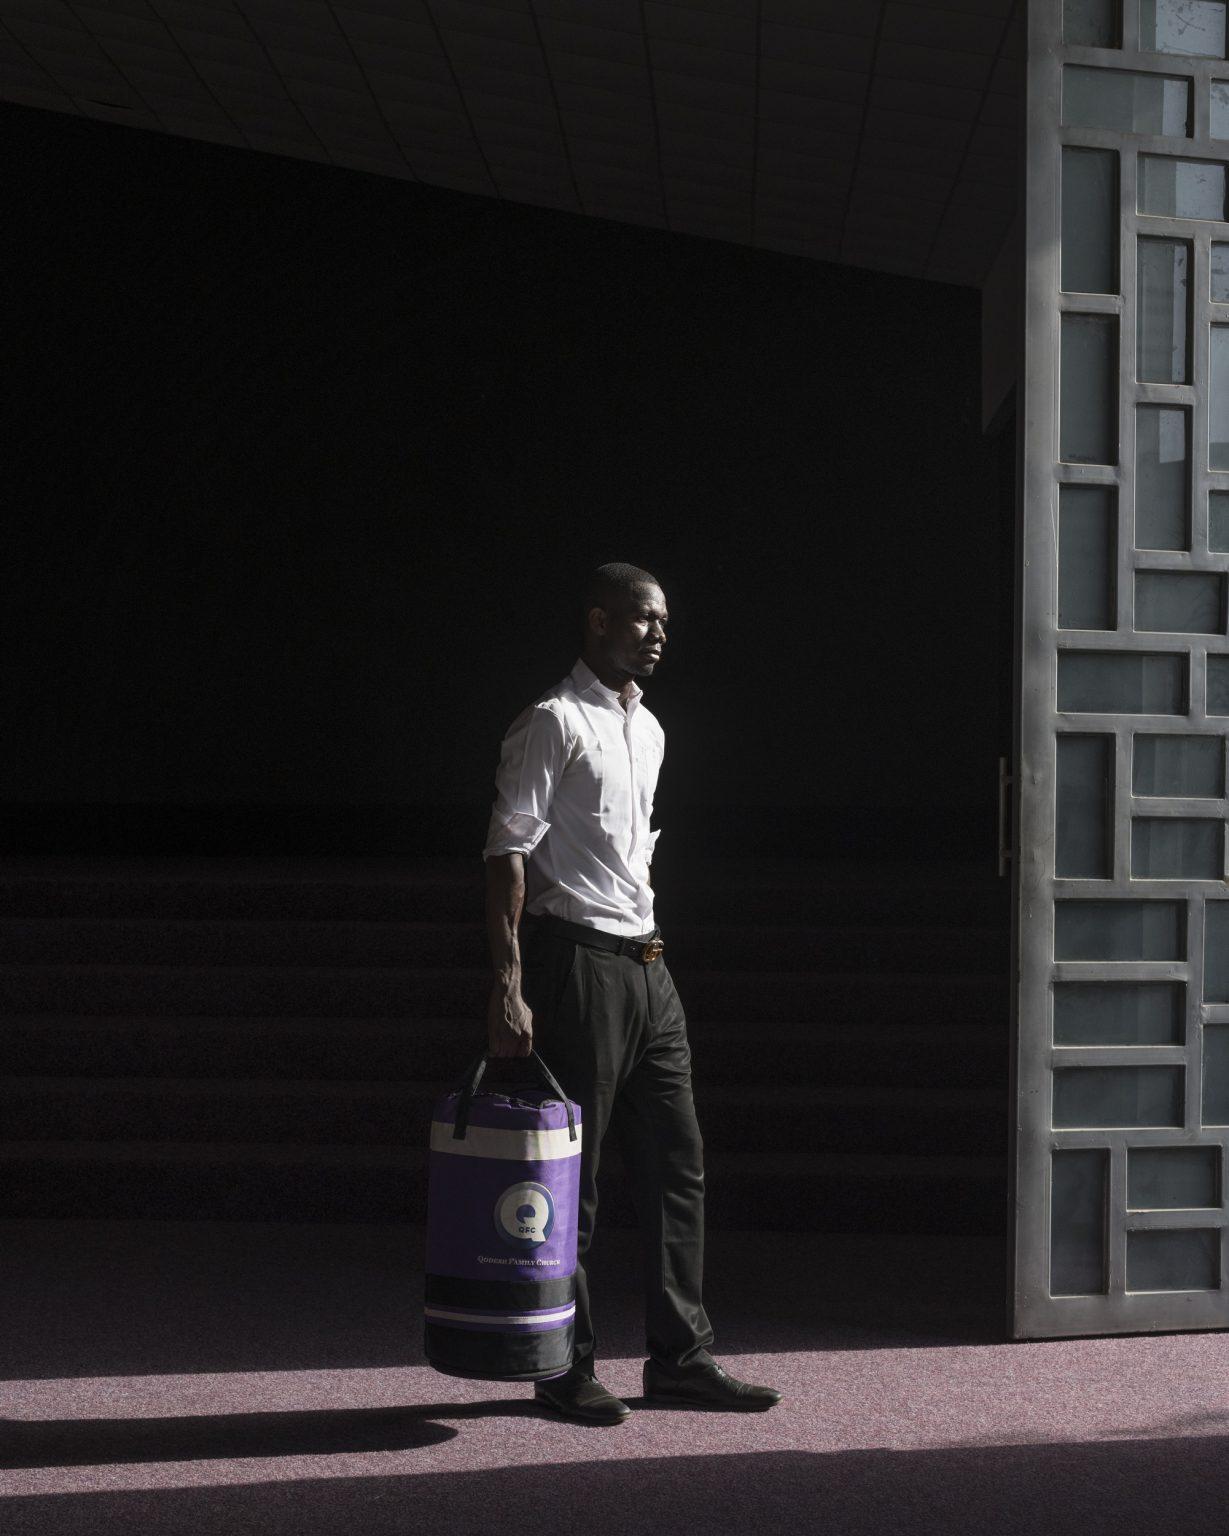 "Legon (Accra), Greater Accra Region, Republic of Ghana, April 2019 - Portrait of an usher at ""Qodesh Family Church, The Qedesh"". The Qedesh is a church of Lighthouse Chapel International inaugurated in 2017 and located in East Legon Hills district. Lighthouse Chapel International(LCI), founded in 1988 byDag Heward-Millsand headquartered inAccra it is considered to be one of the leading charismatic churches inGhana, and has over 3000 branches in over 50 countries inAfrica,Europe,Asia, theCaribbean,Australia, theMiddle Eastand theAmericas. Lighthouse Chapel International is one of the largest of the Pentecostal churches that have appeared since the late 1970s in cities in Africa. Its founder is nowadays considered among the richest pastors in Ghana. ><  Legon (Accra), Grande Regione di Accra, Repubblica del Ghana, aprile 2019 - Ritratto di un usciere presso ""Qodesh Family Church, The Qedesh"". The Qedesh è una chiesa della Lighthouse Chapel International inaugurata nel 2017 e situata nel distretto di East Legon Hills. Lighthouse Chapel International (LCI), fondata nel 1988 da Dag Heward-Mills e con sede ad Accra, è considerata una delle principali chiese carismatiche del Ghana e conta oltre 3000 filiali in oltre 50 paesi in Africa, Europa, Asia, i Caraibi, l'Australia, il Medio Oriente e le Americhe. Lighthouse Chapel International è una delle più grandi chiese pentecostali apparse dalla fine degli anni '70 nelle città dell'Africa. Il suo fondatore è oggi considerato tra i pastori più ricchi del Ghana."